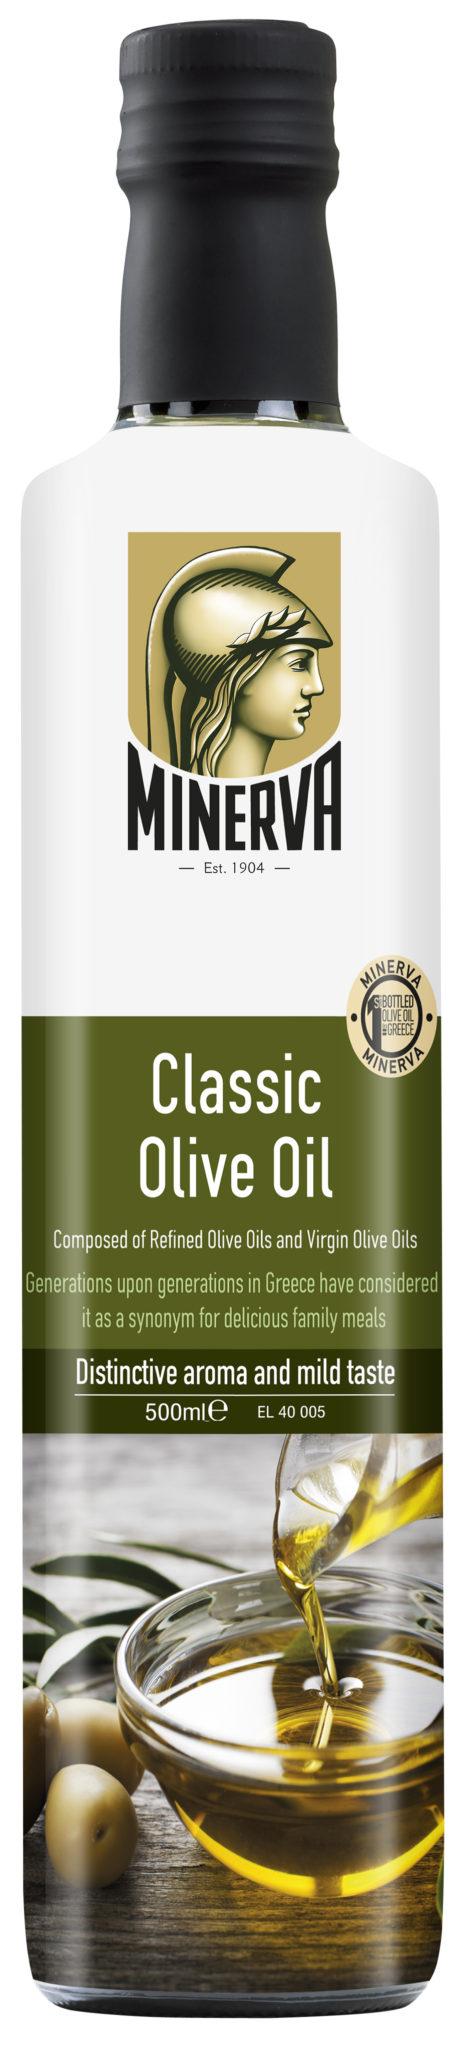 Minerva Classic Olive Oil